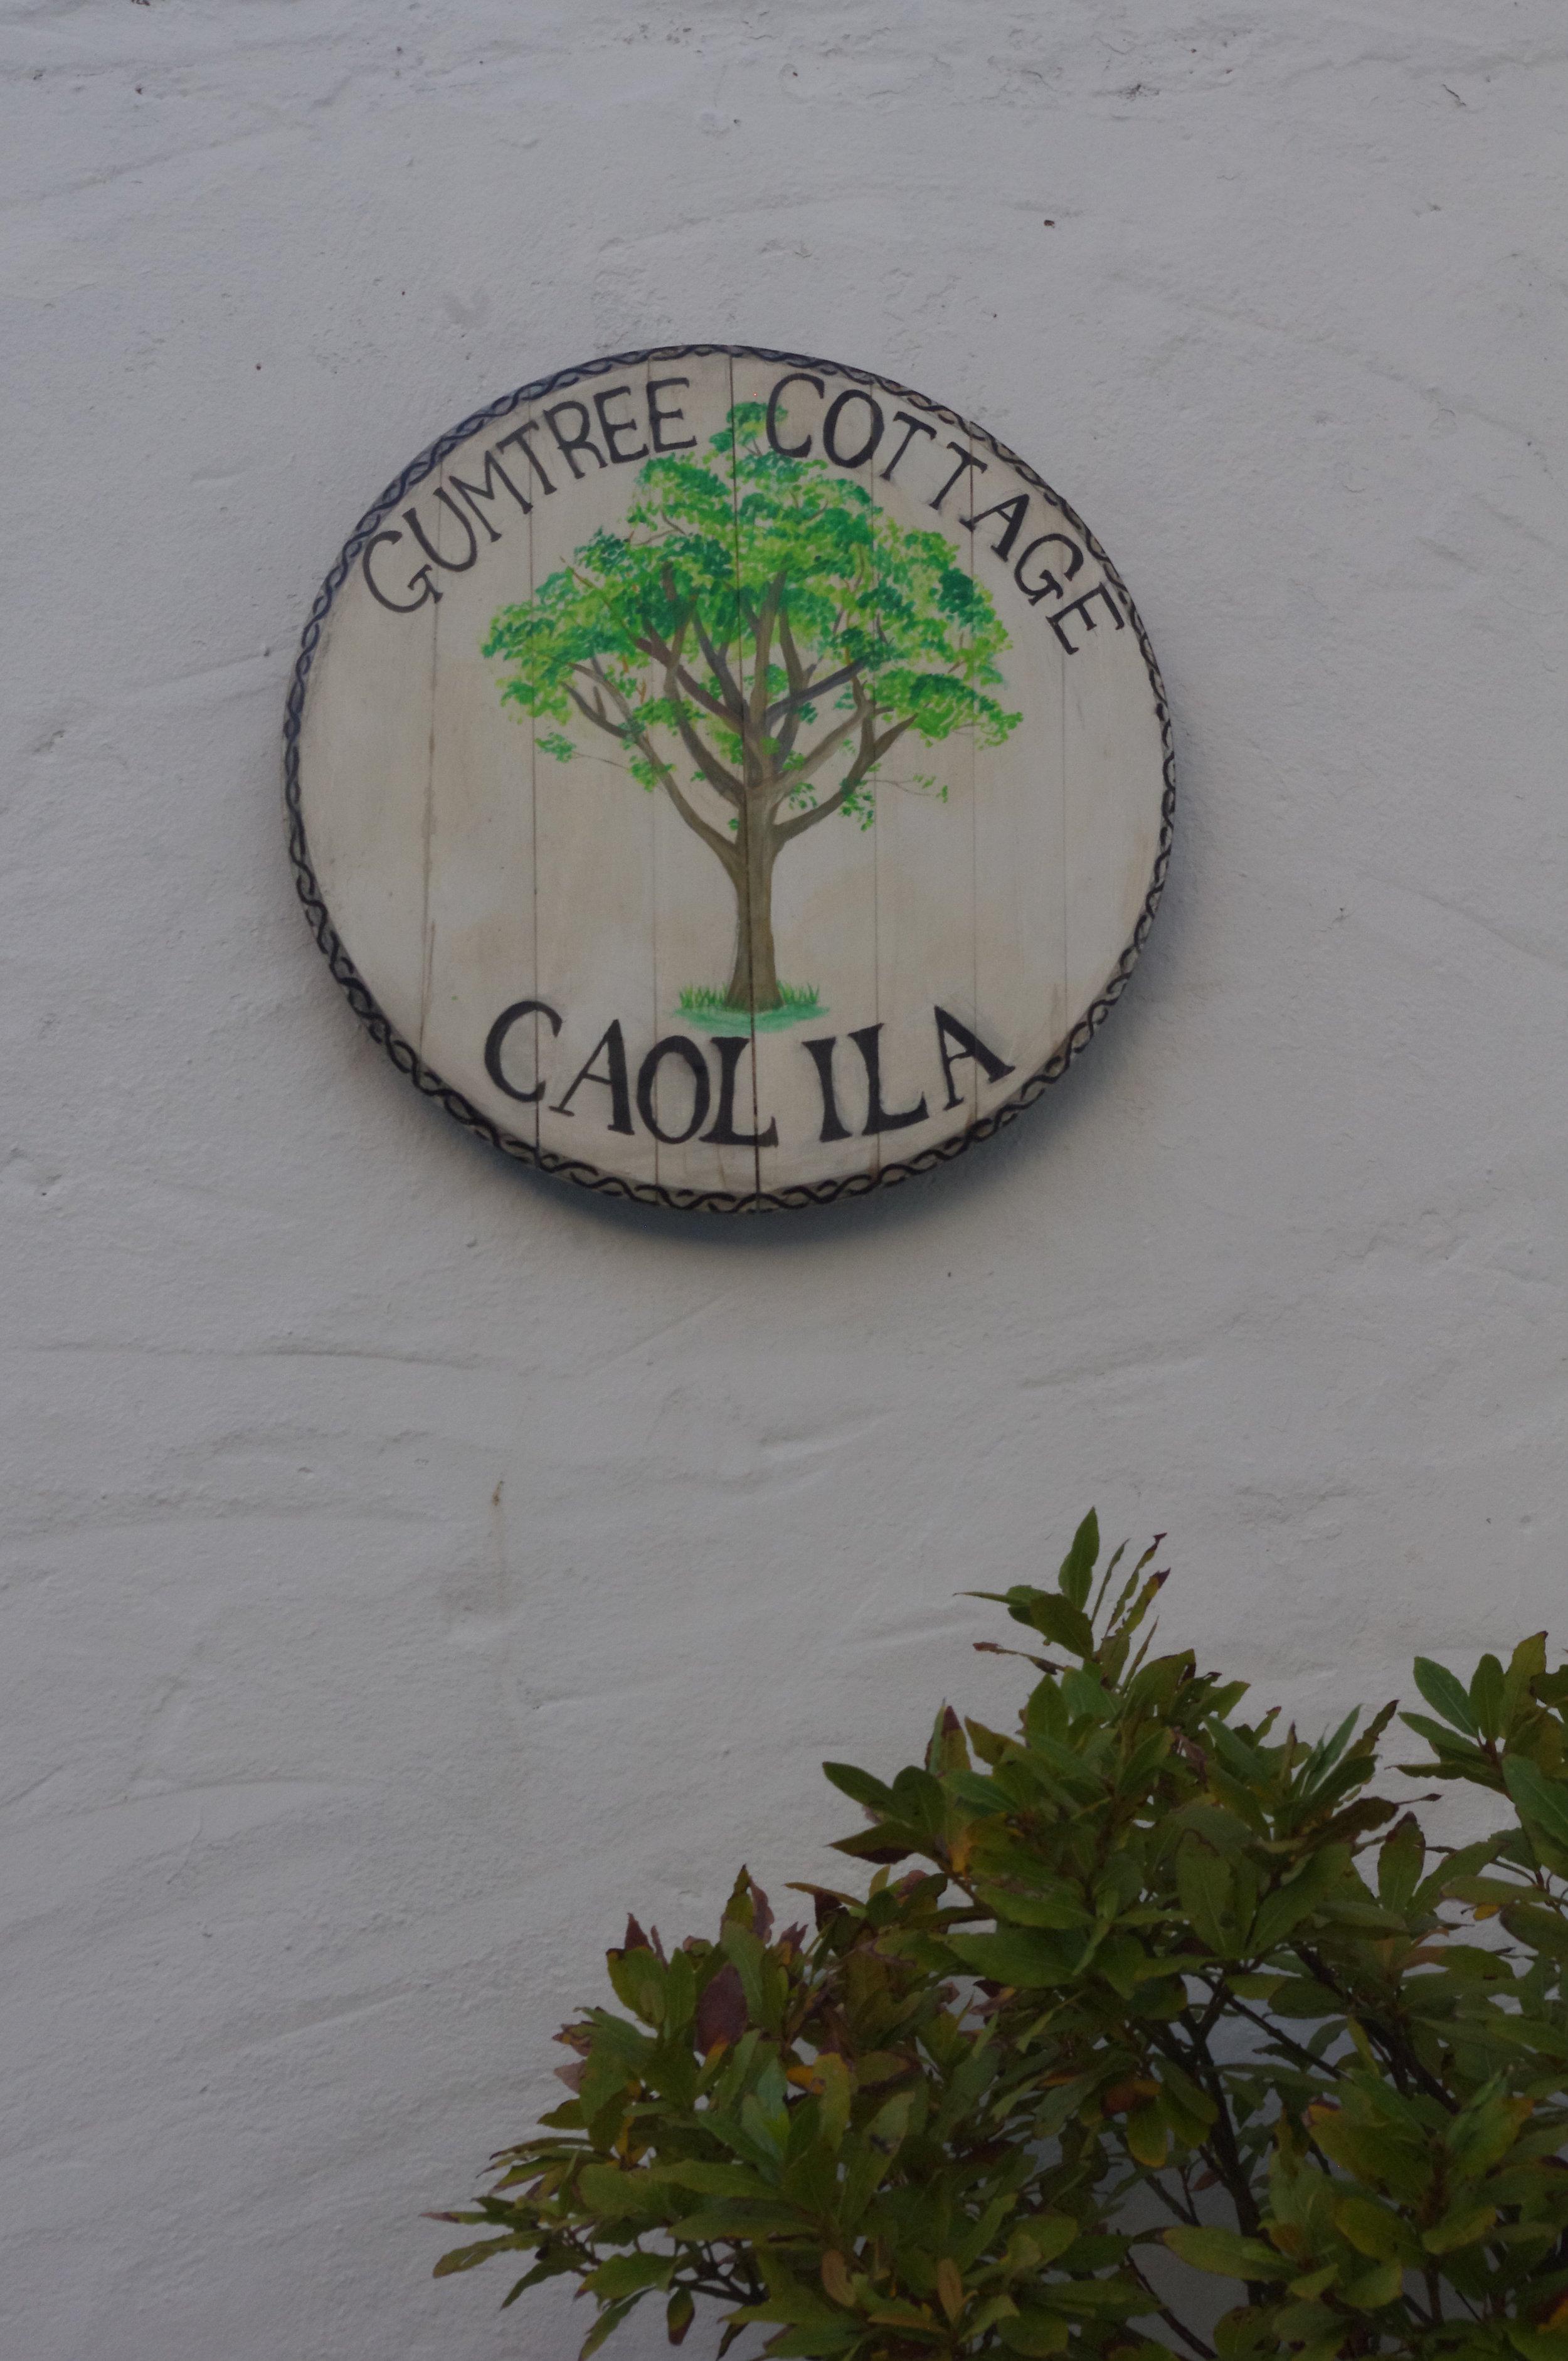 Gumtree Cottage - Sign - Photograph 2.JPG